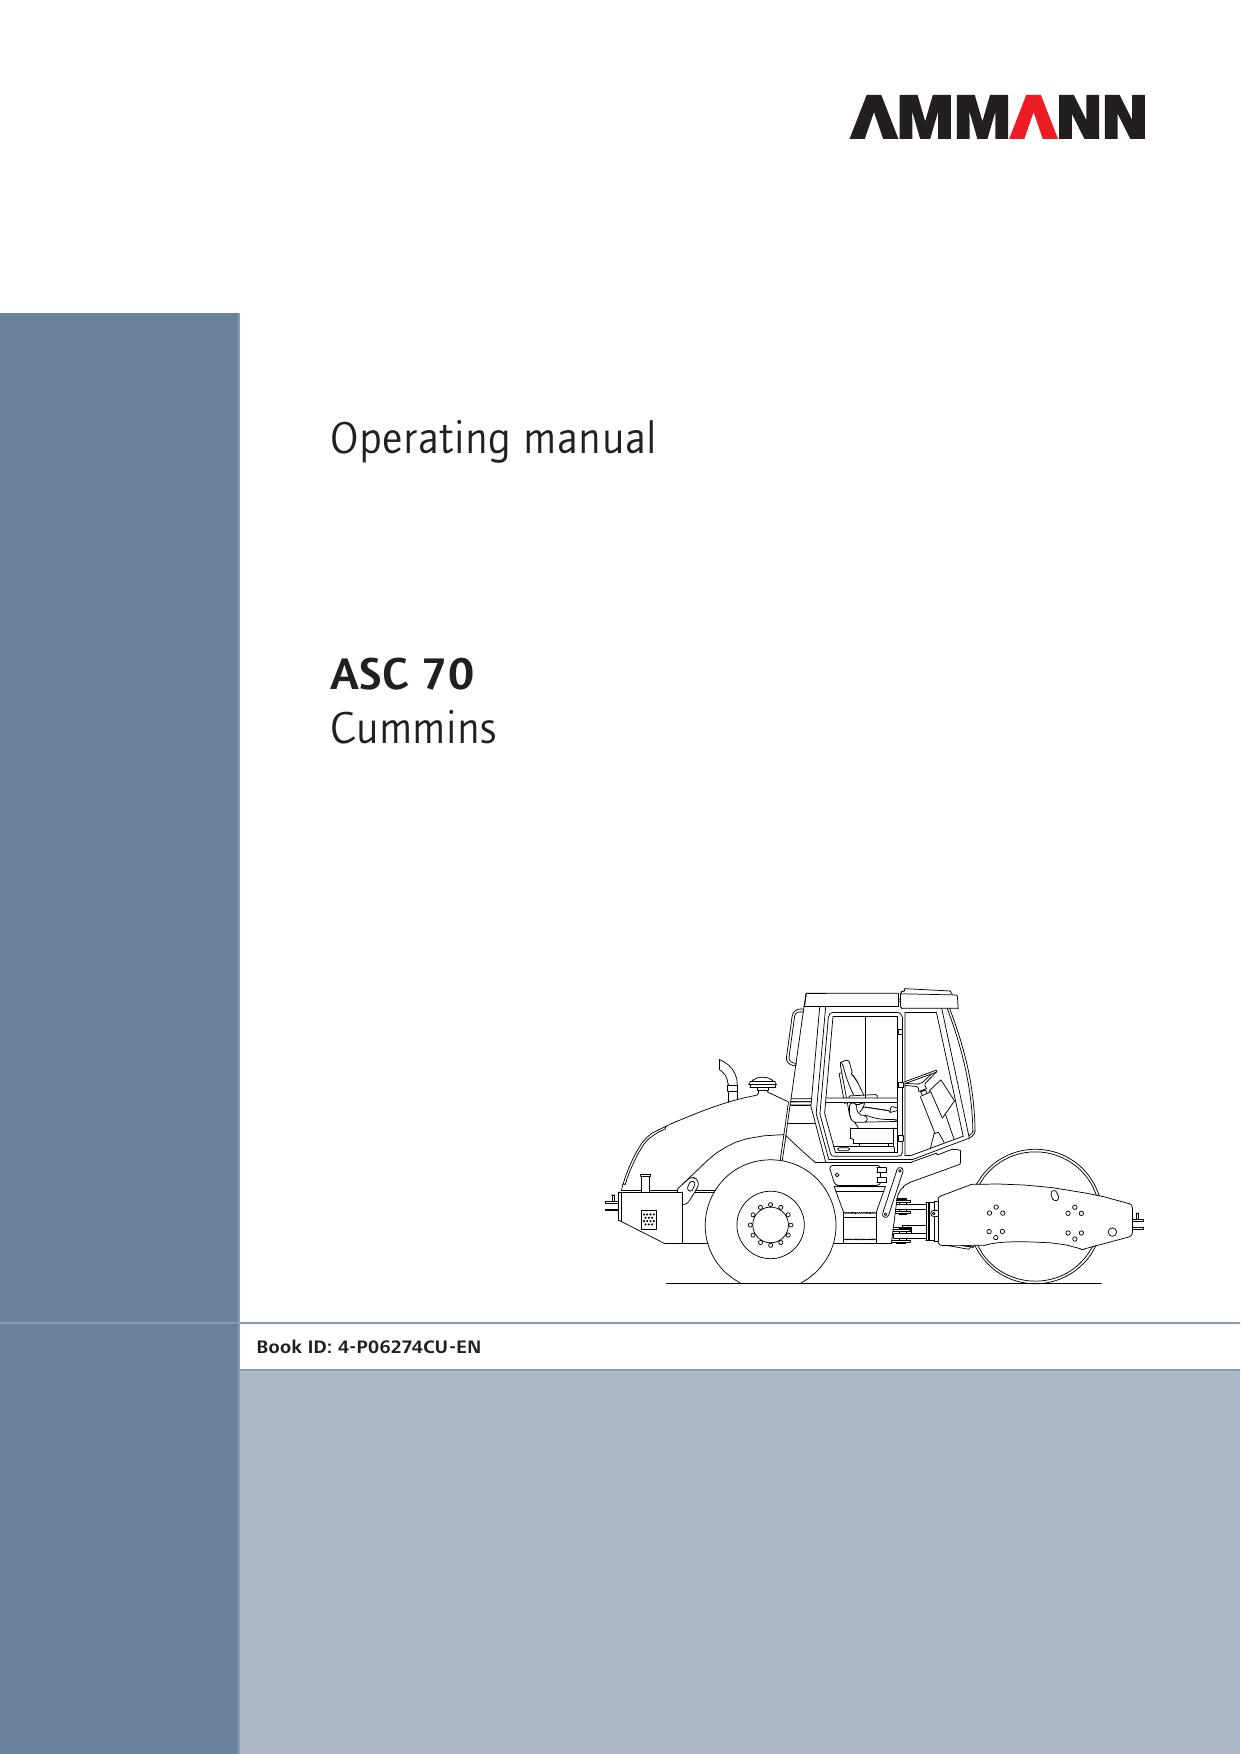 Operating manual - ASC 70 Murphy Cummins Tier 3 - en   manualzz com